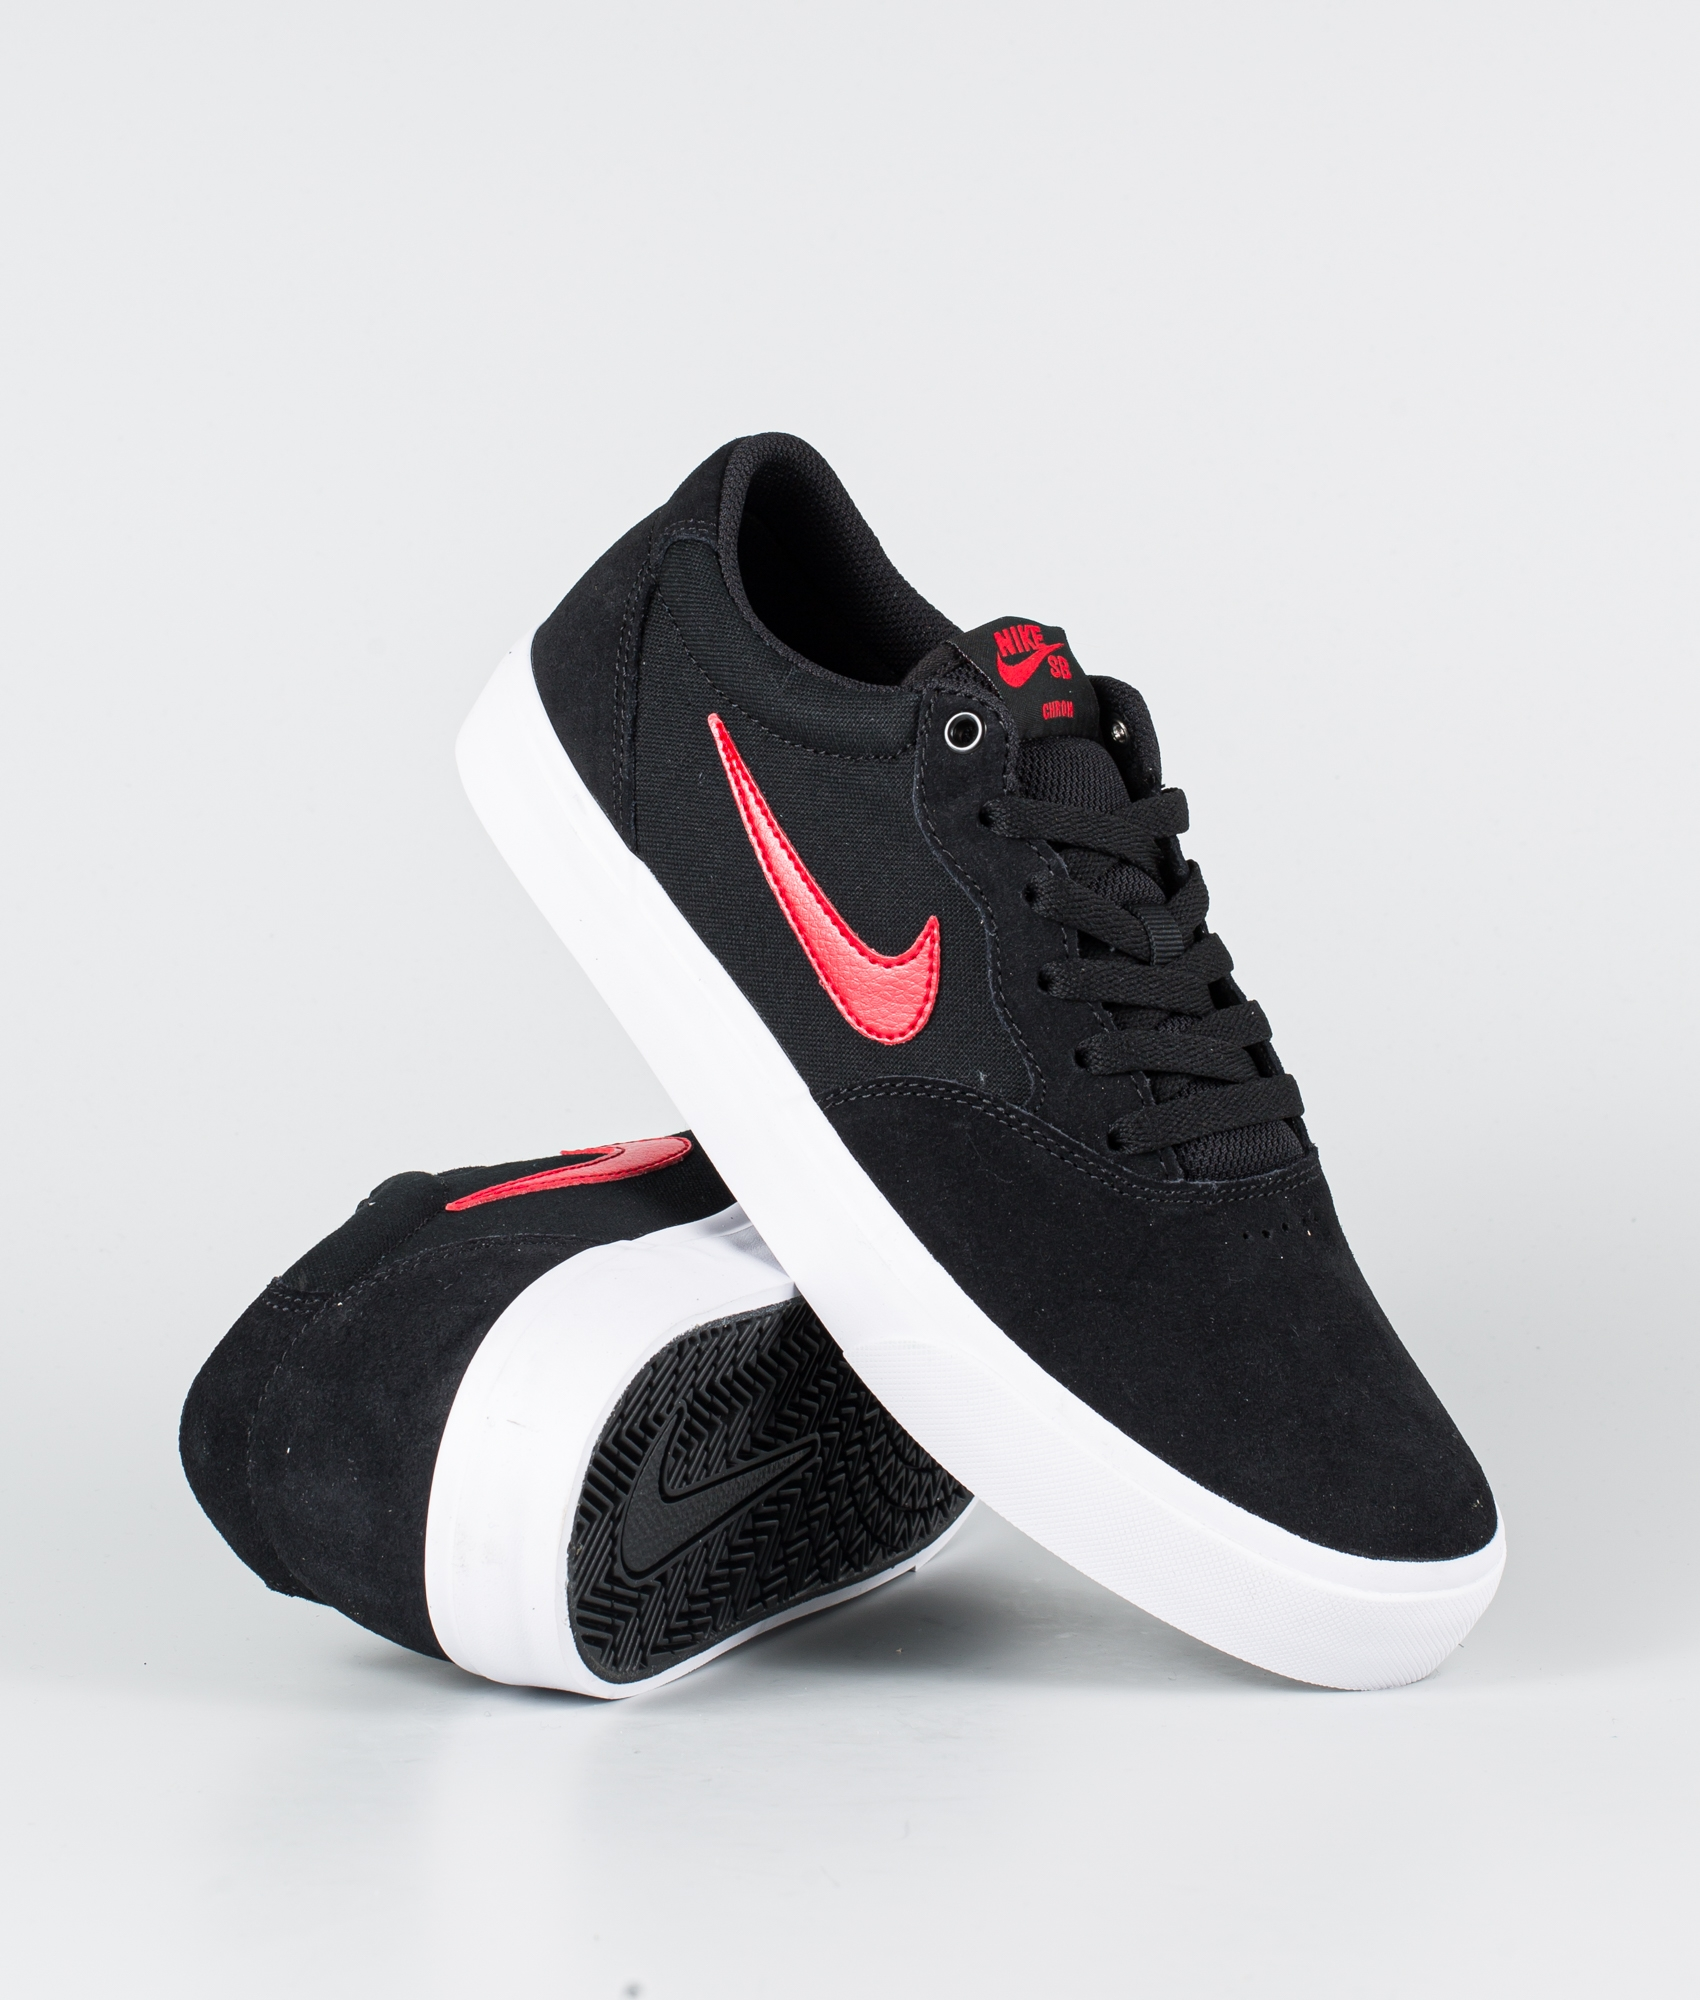 Nike SB Chron Solarsoft Shoes Black/University Red